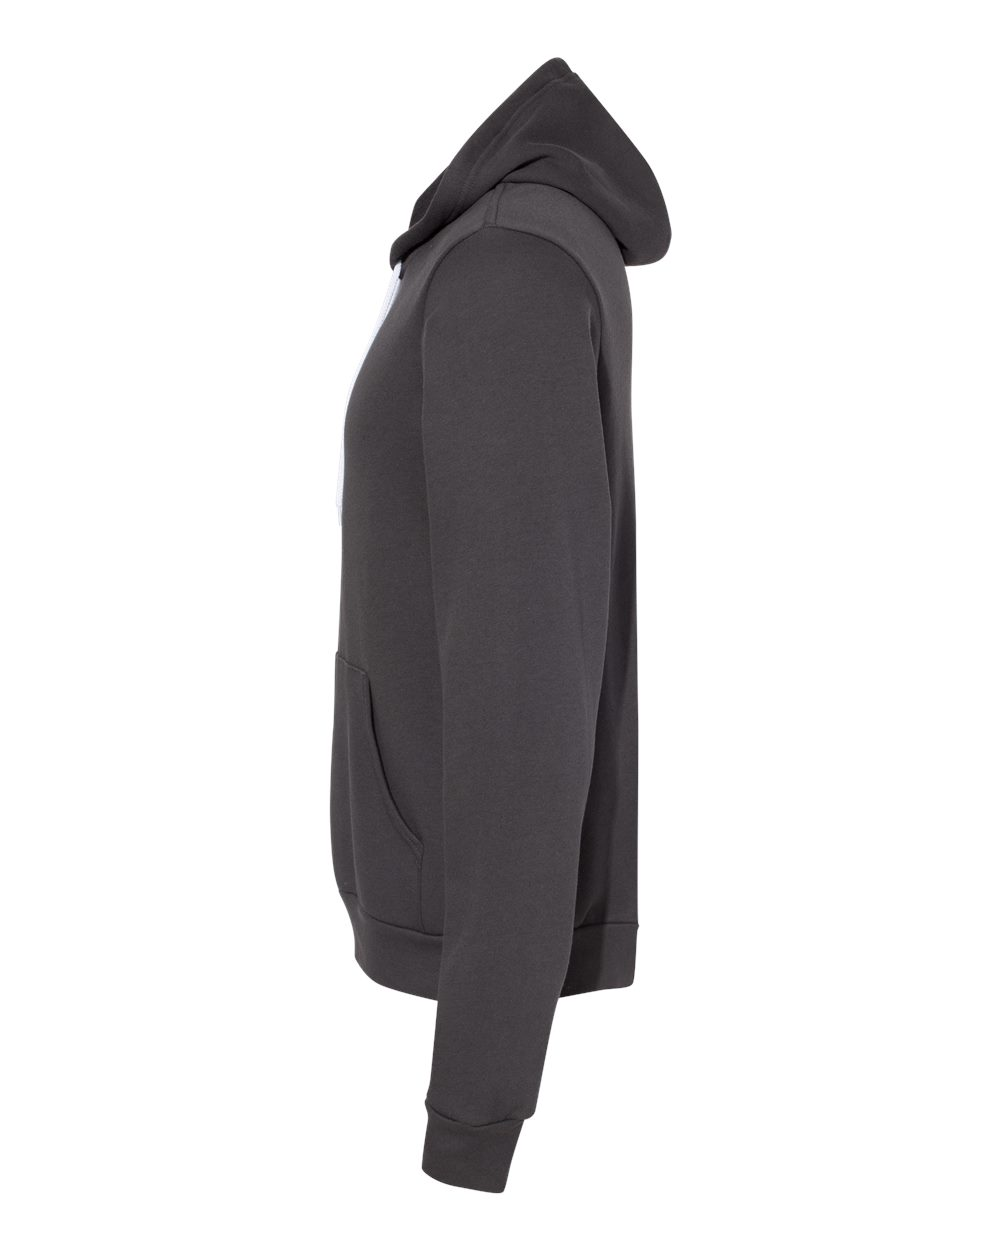 BELLA & CANVAS Customizable Hoodie in Dark Grey- Side View